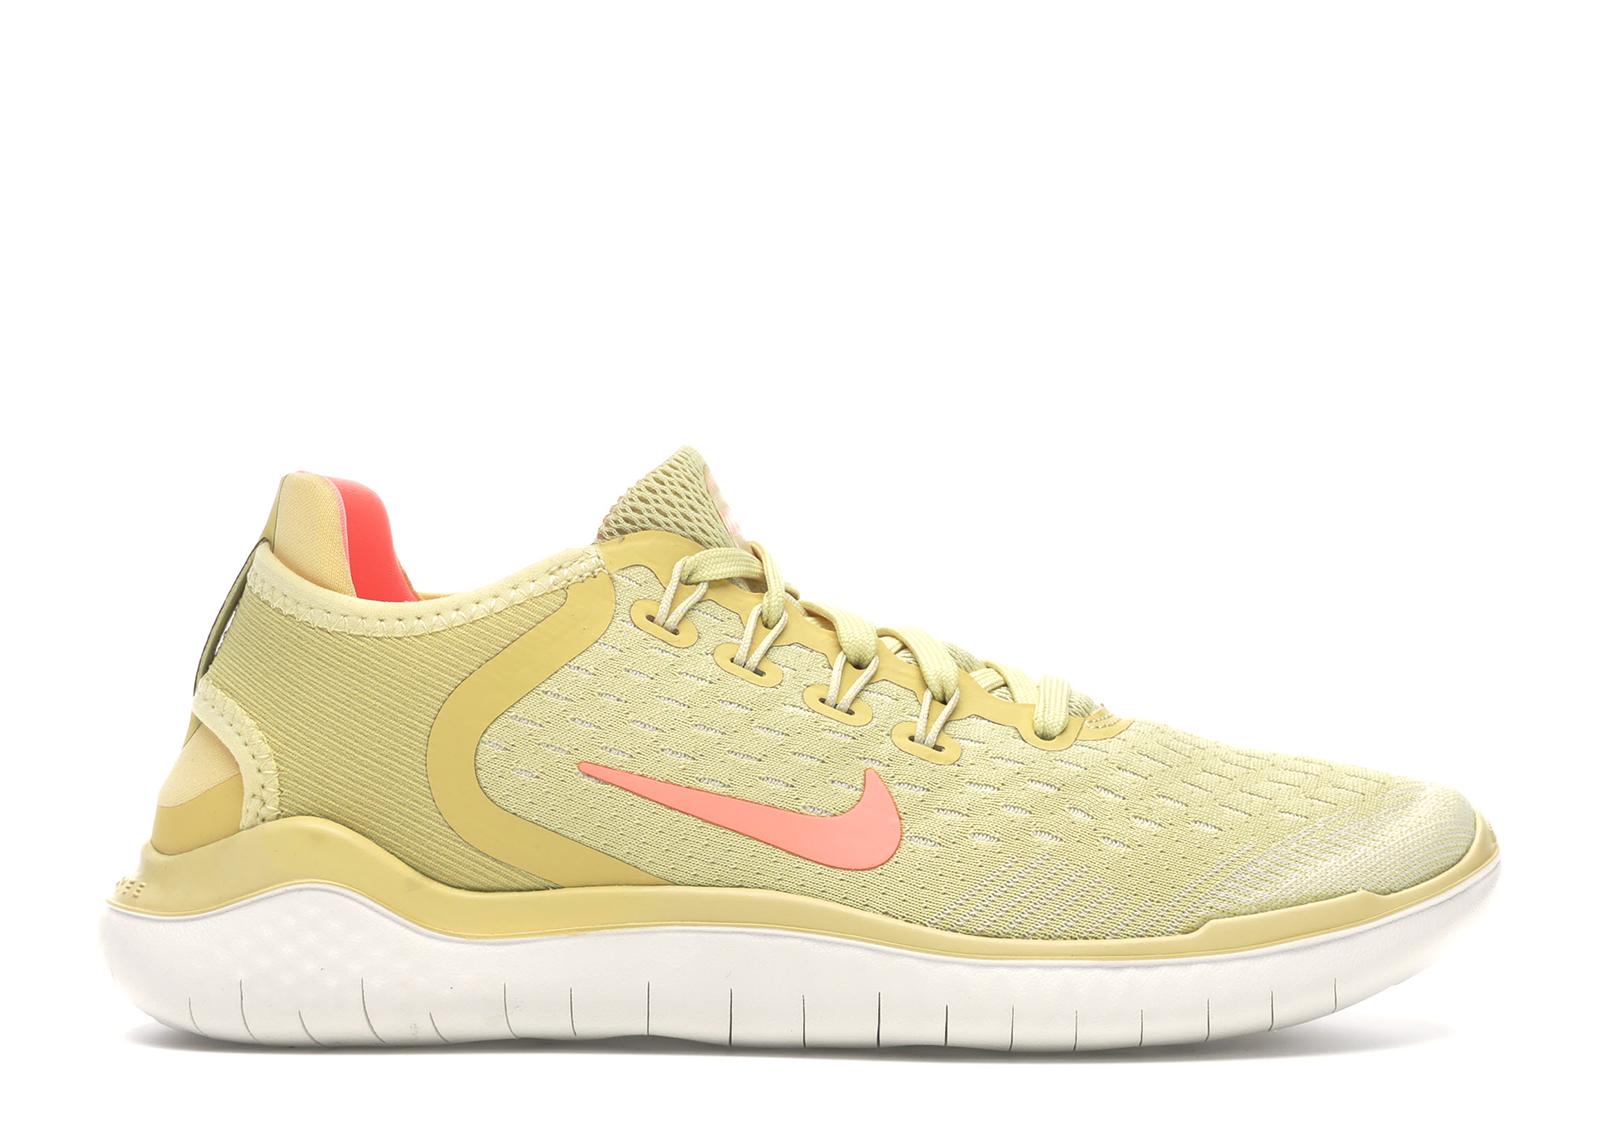 Nike Free RN 2018 Summer Lemon Wash (W